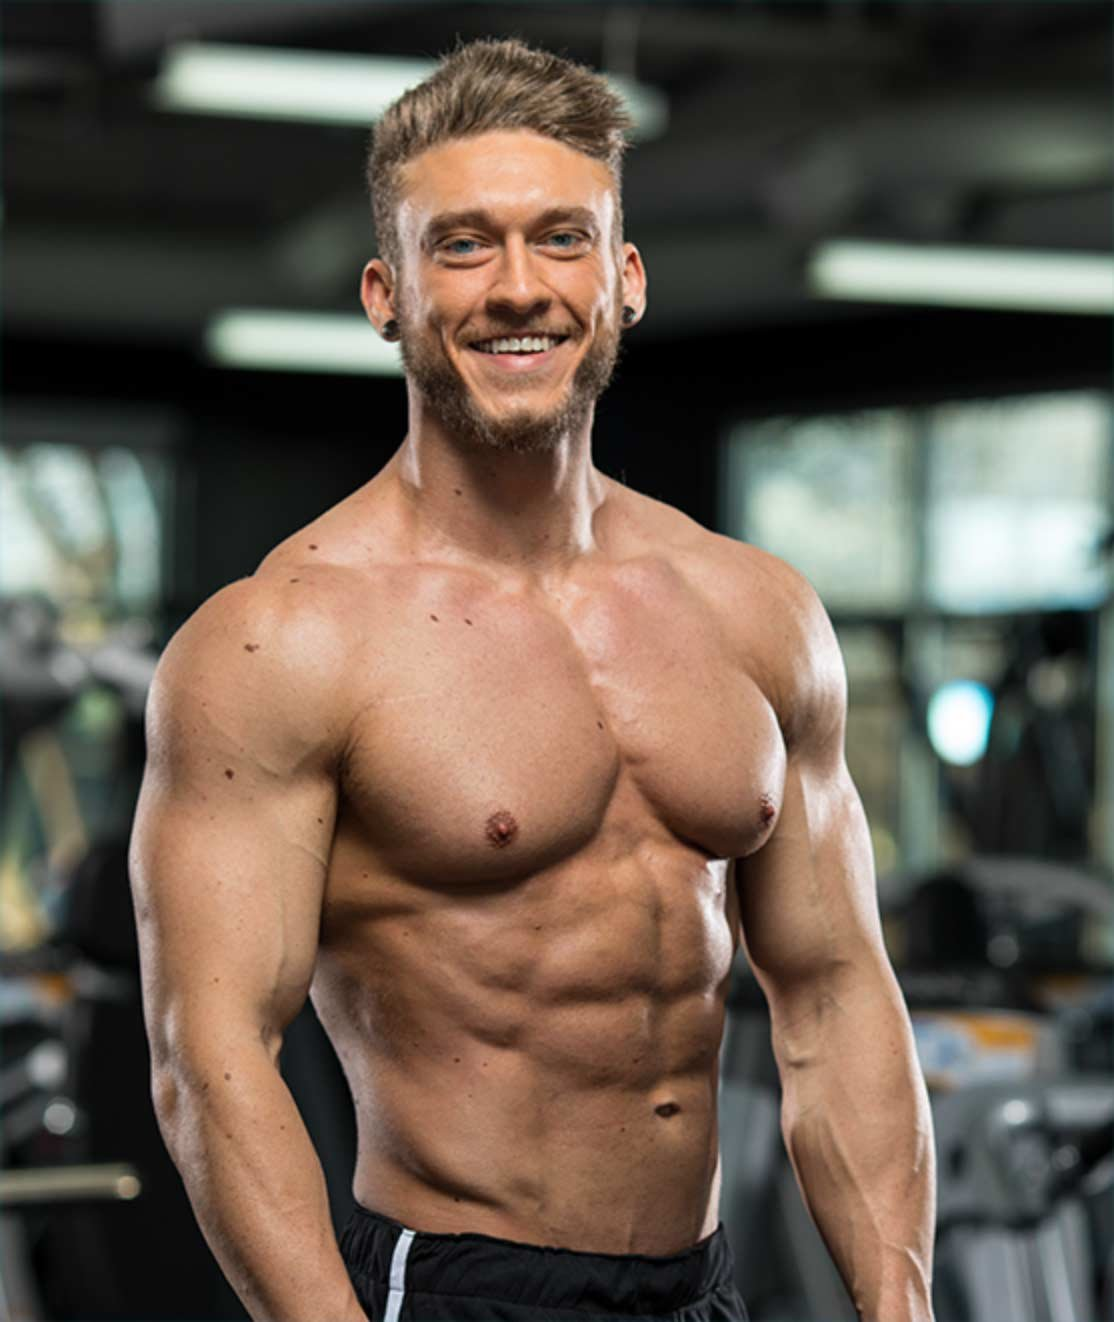 2018 Spokesmodel Search | Bodybuilding.com